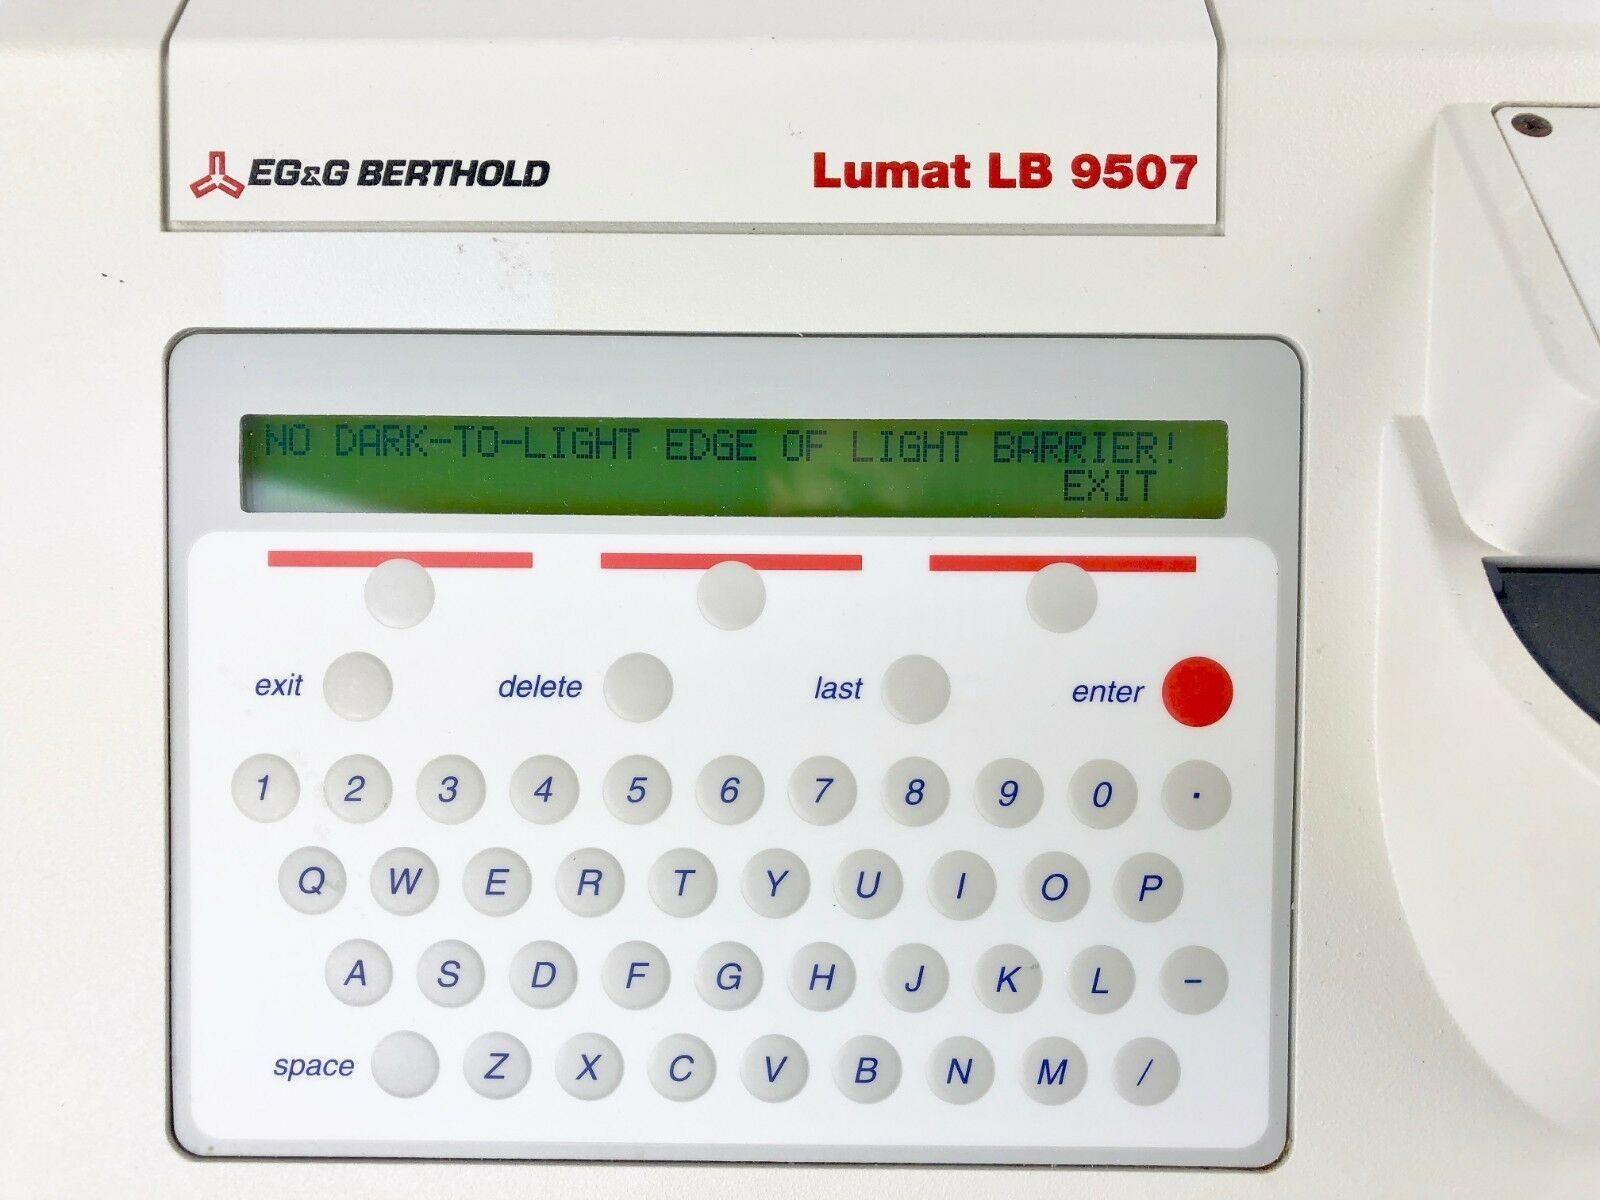 Lumat LB 9507 Ultra Sensitive Tube Luminoter by Berthold Technologies